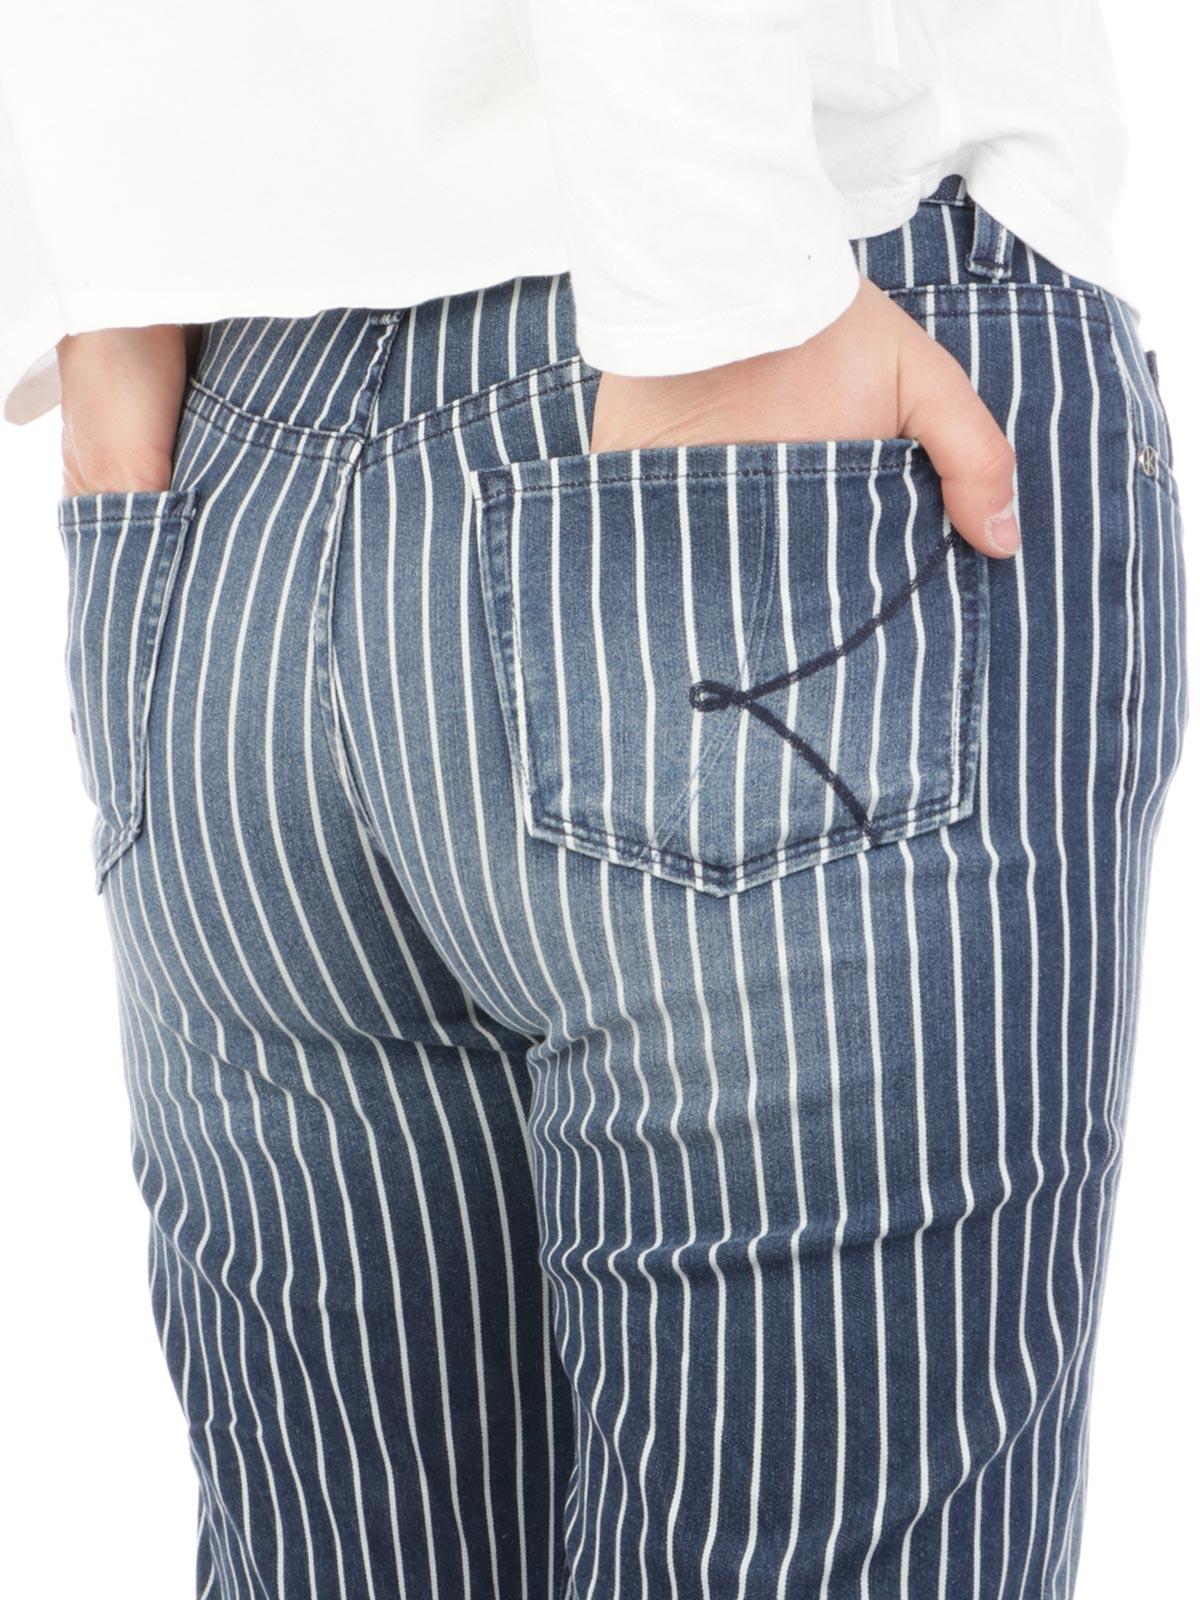 Immagine di Kaos | Trousers Pantalone